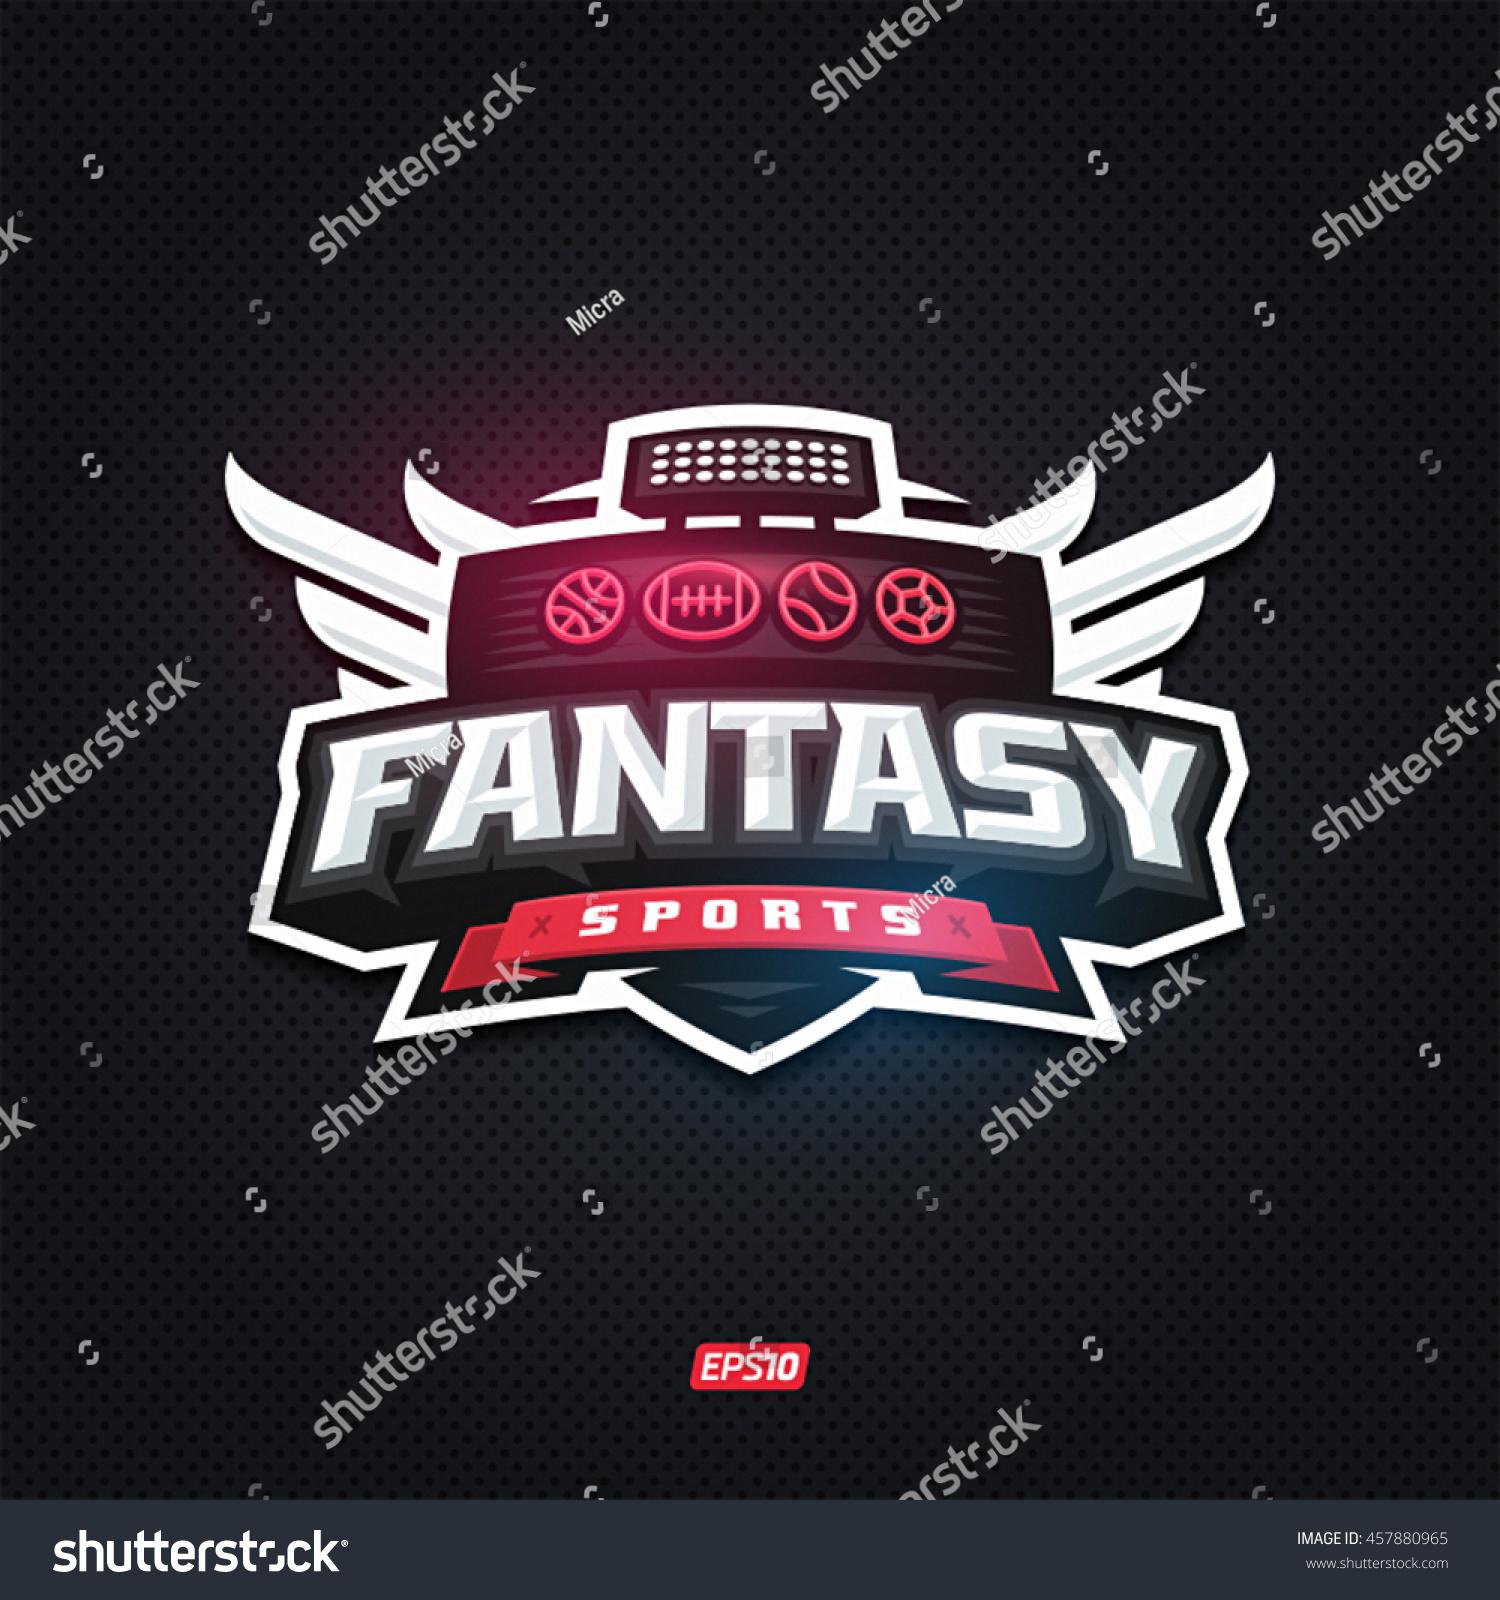 Modern professional fantasy sports template logo design